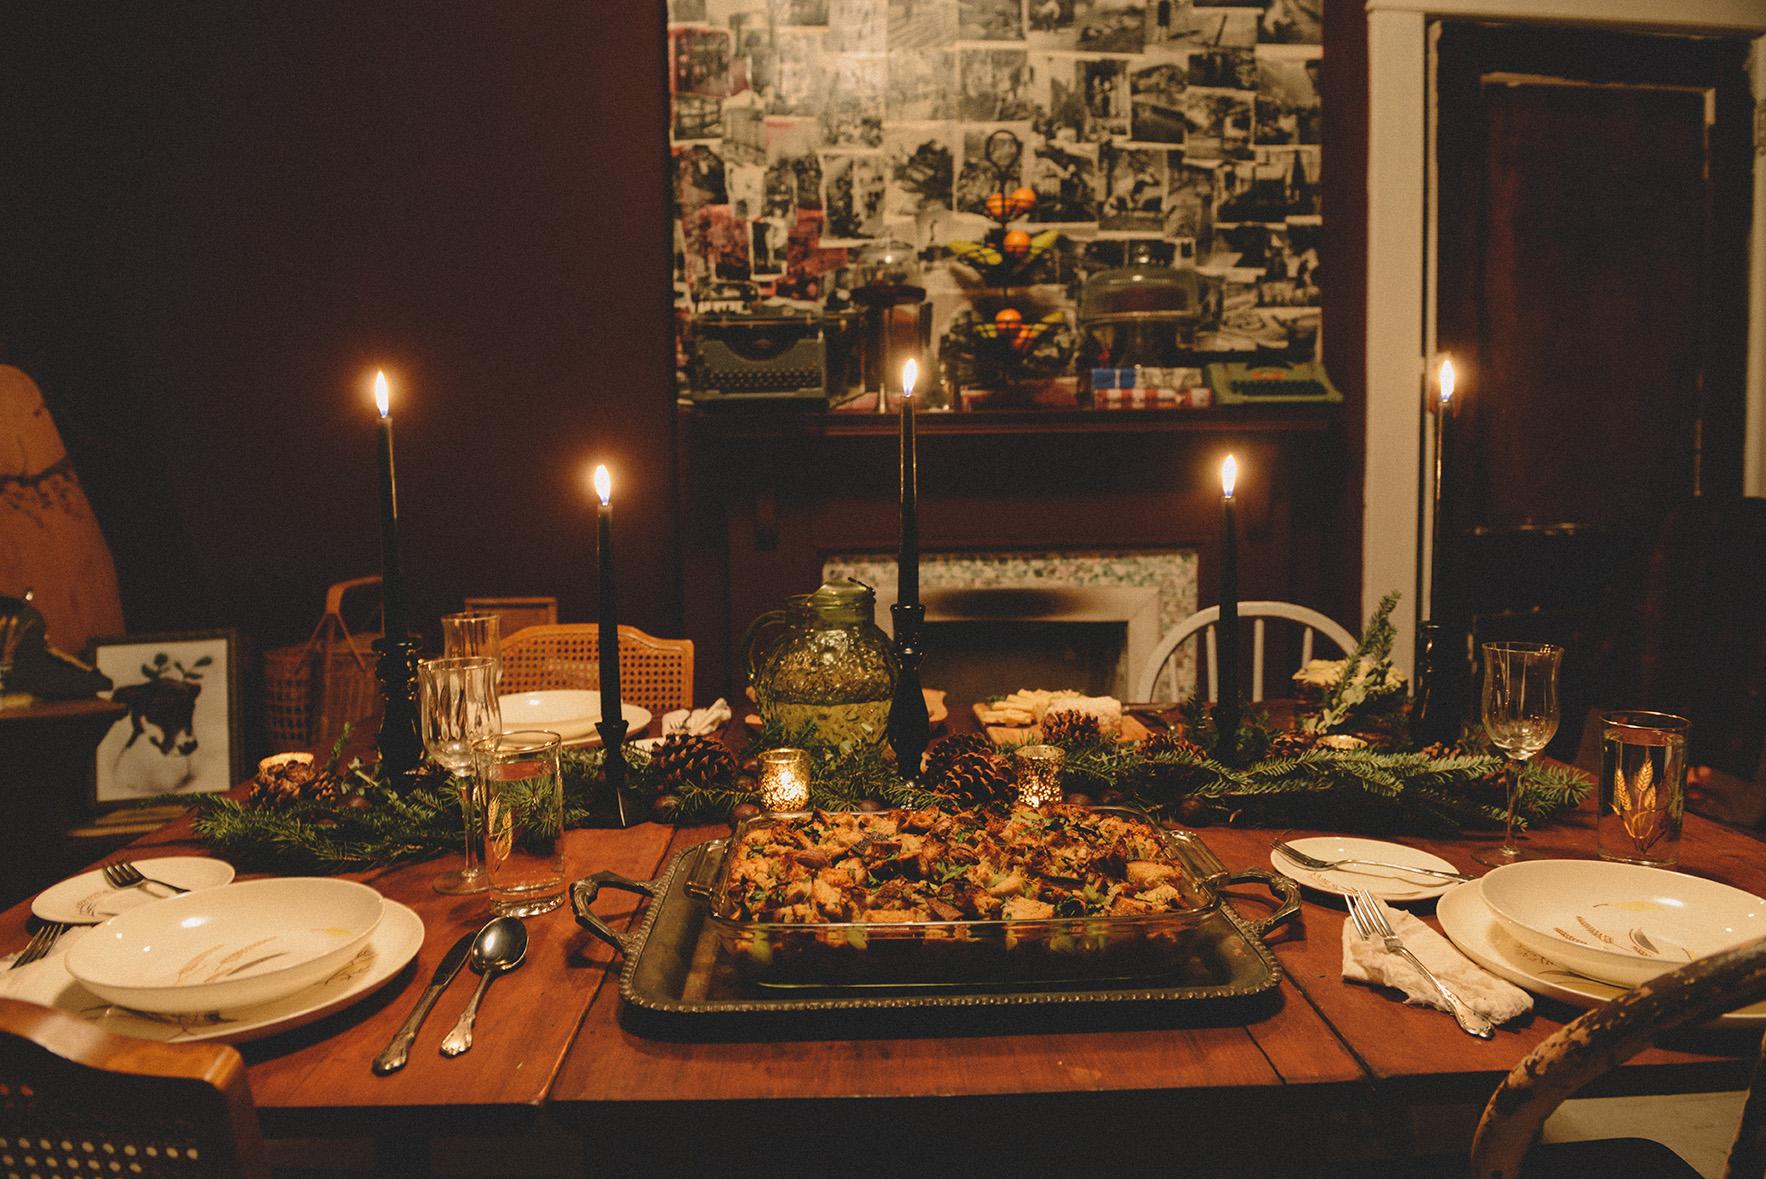 A Winter Meal & A Chestnut Menu